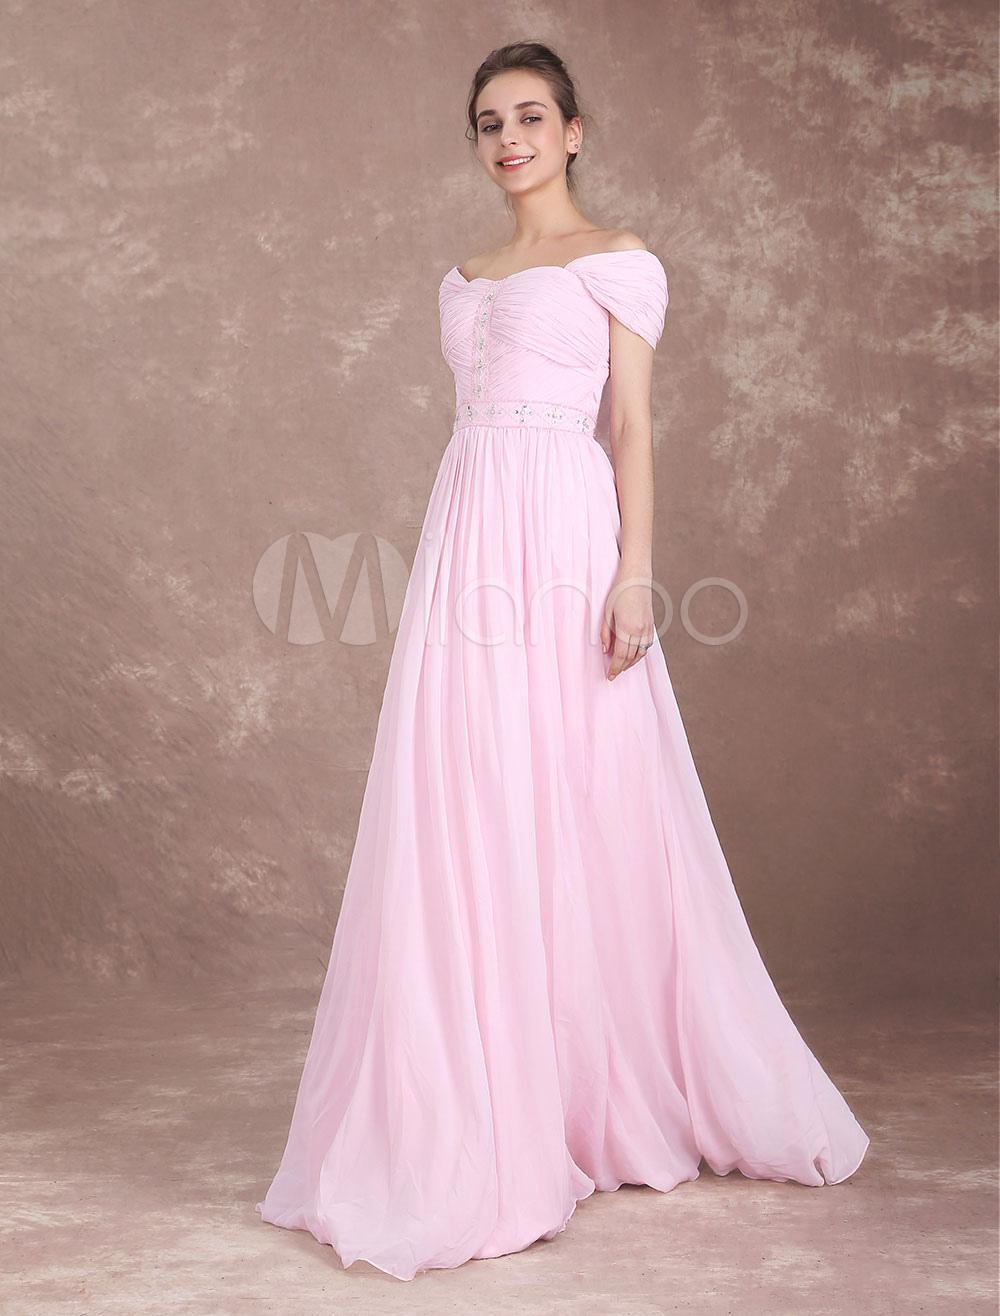 3286ca31ec55 Bridesmaid Dress Soft Pink Chiffon Long Prom Dresses Off The ...